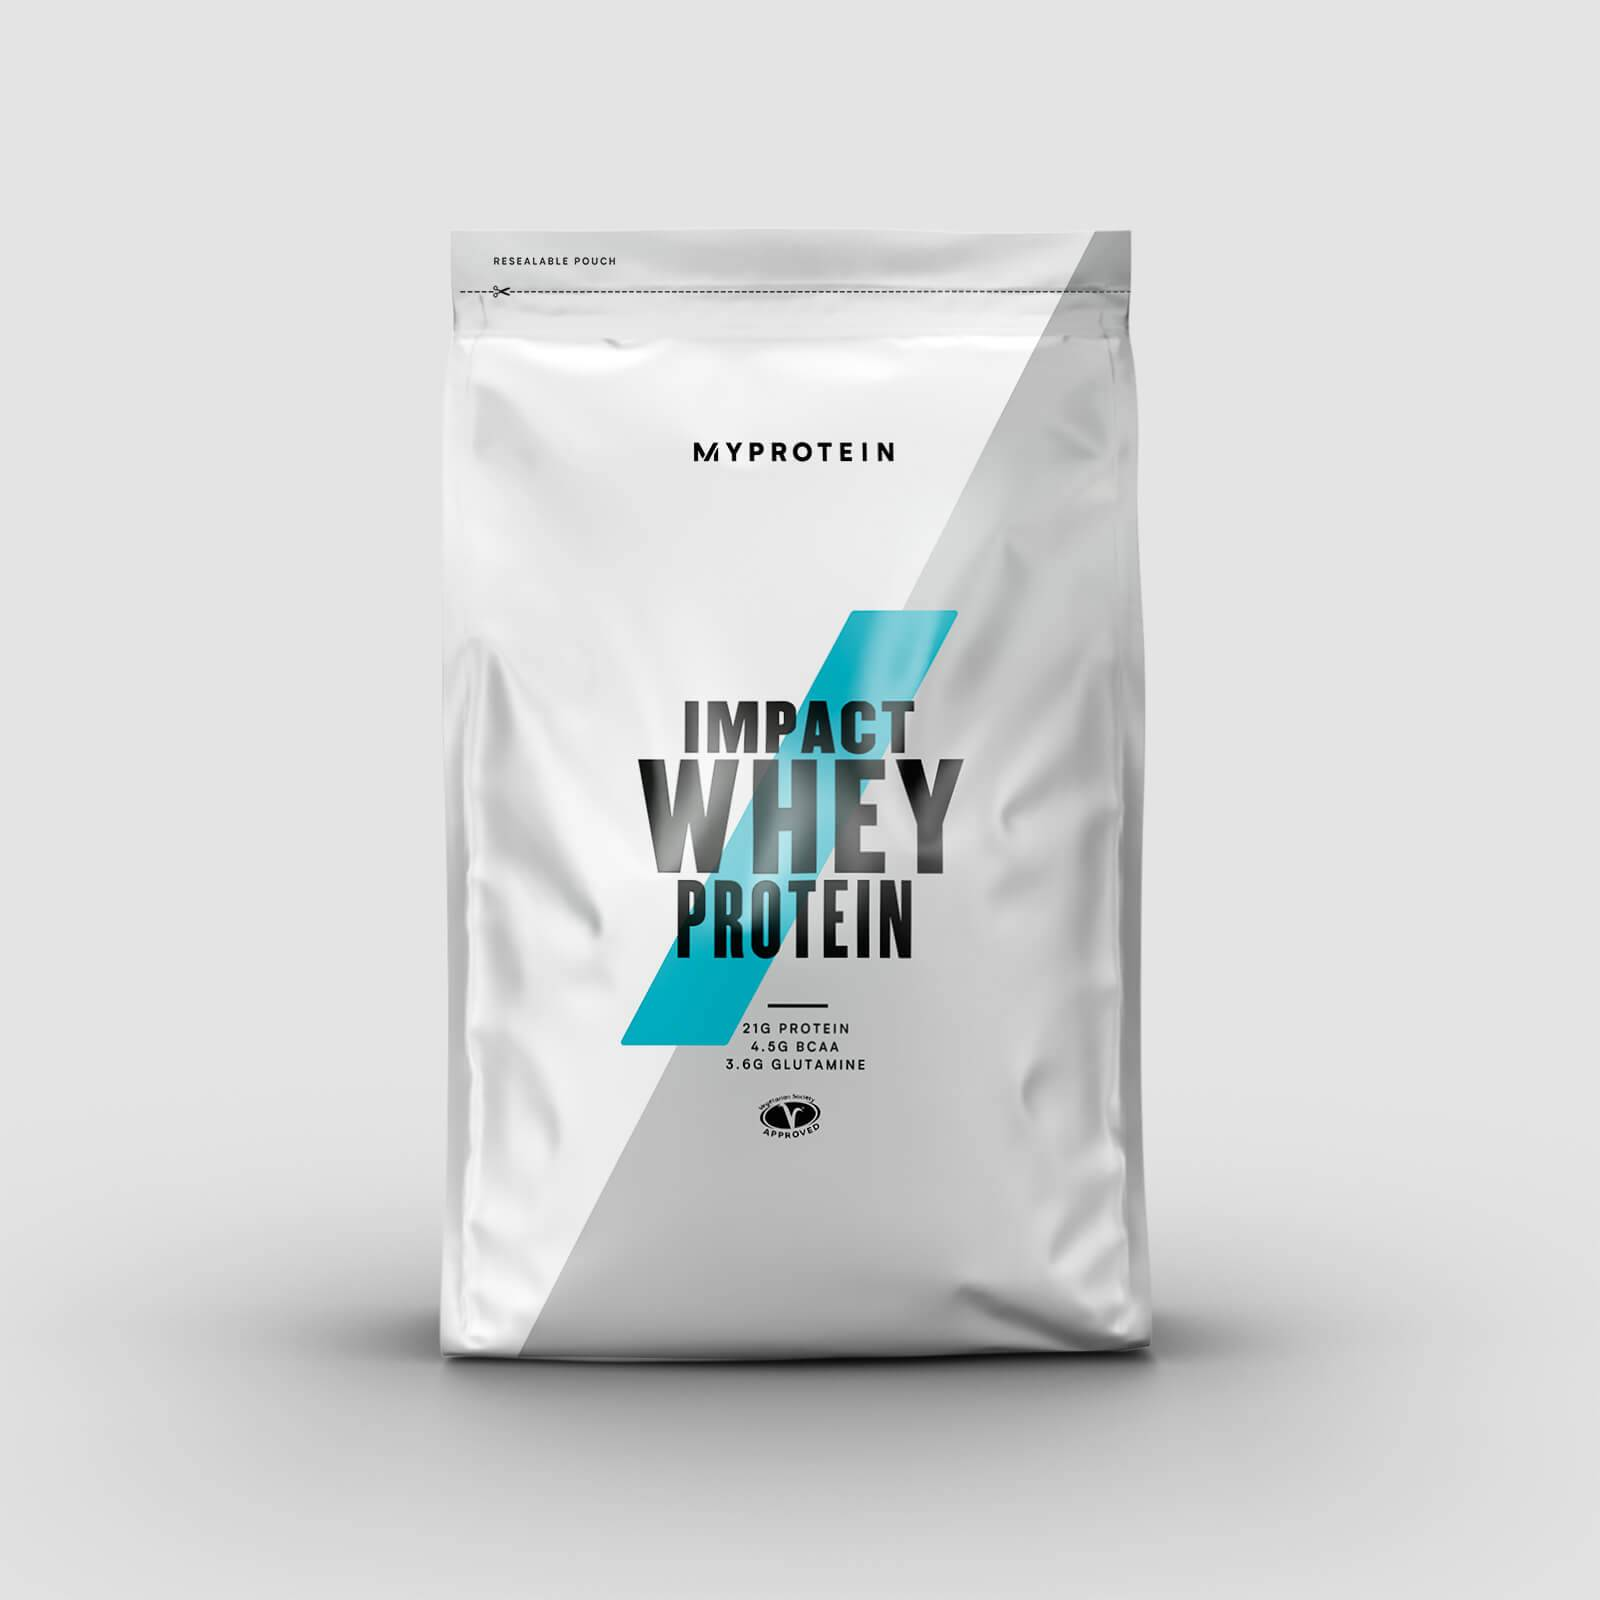 Myprotein Impact Whey Protein - 1kg - Cookies ja Cream